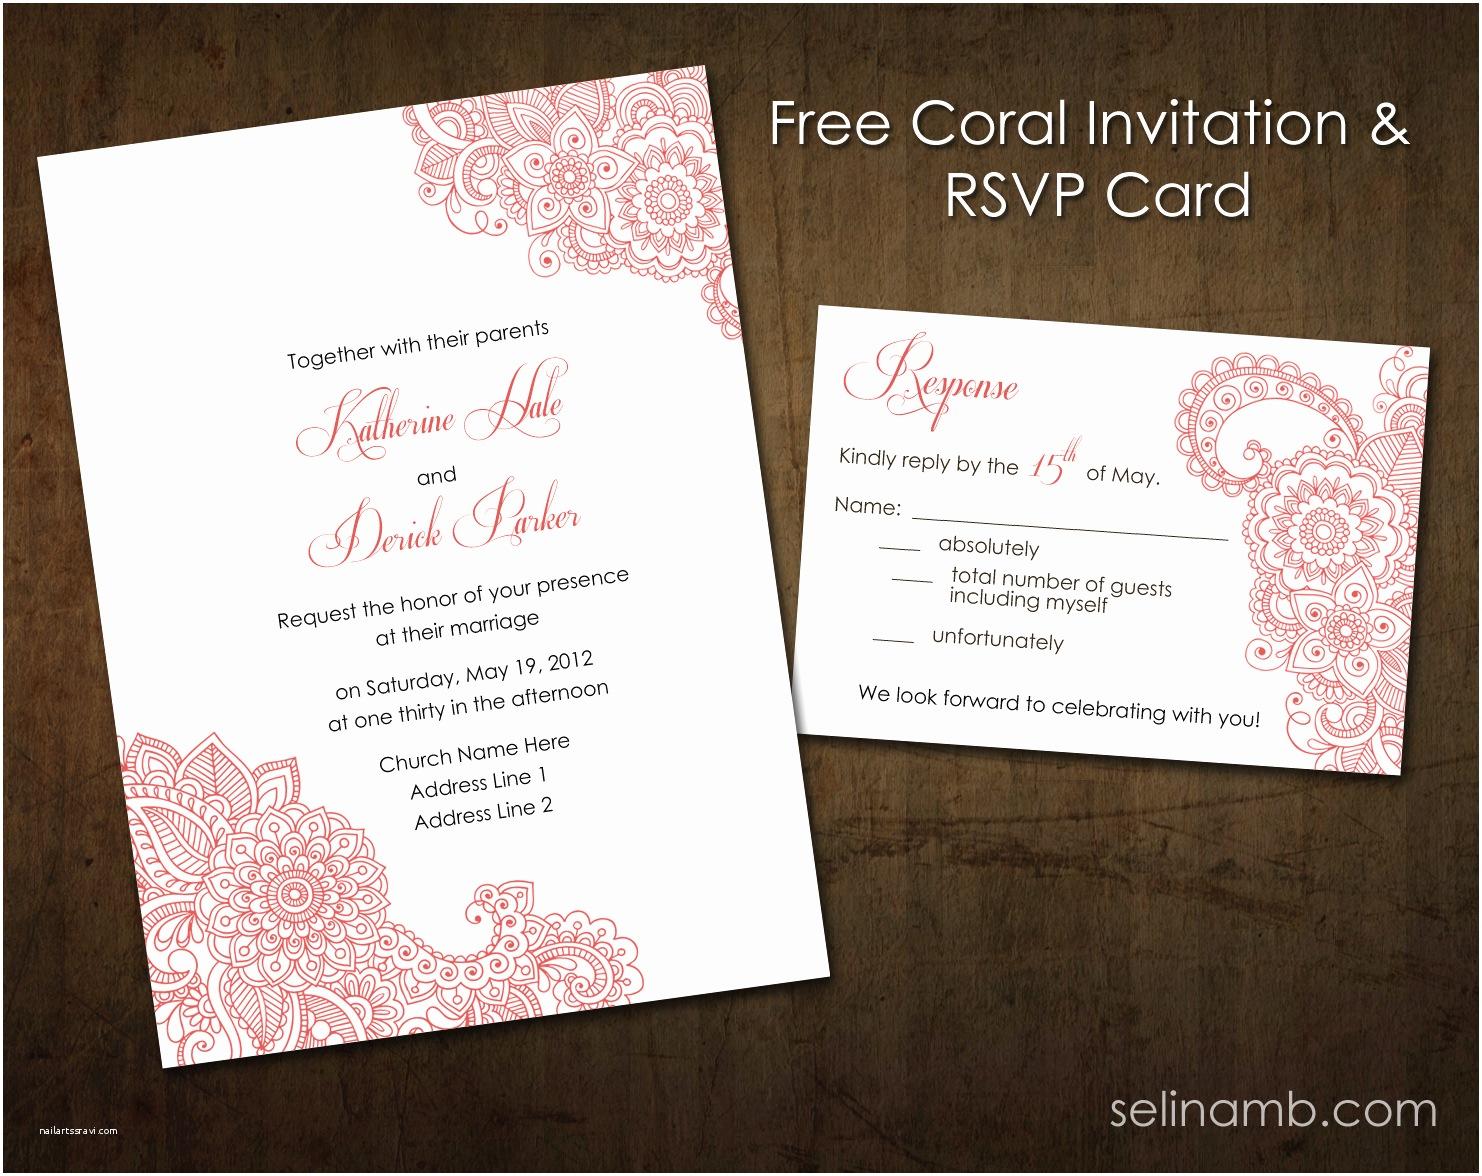 Wedding Invitations and Rsvp Wedding Invitations and Rsvp